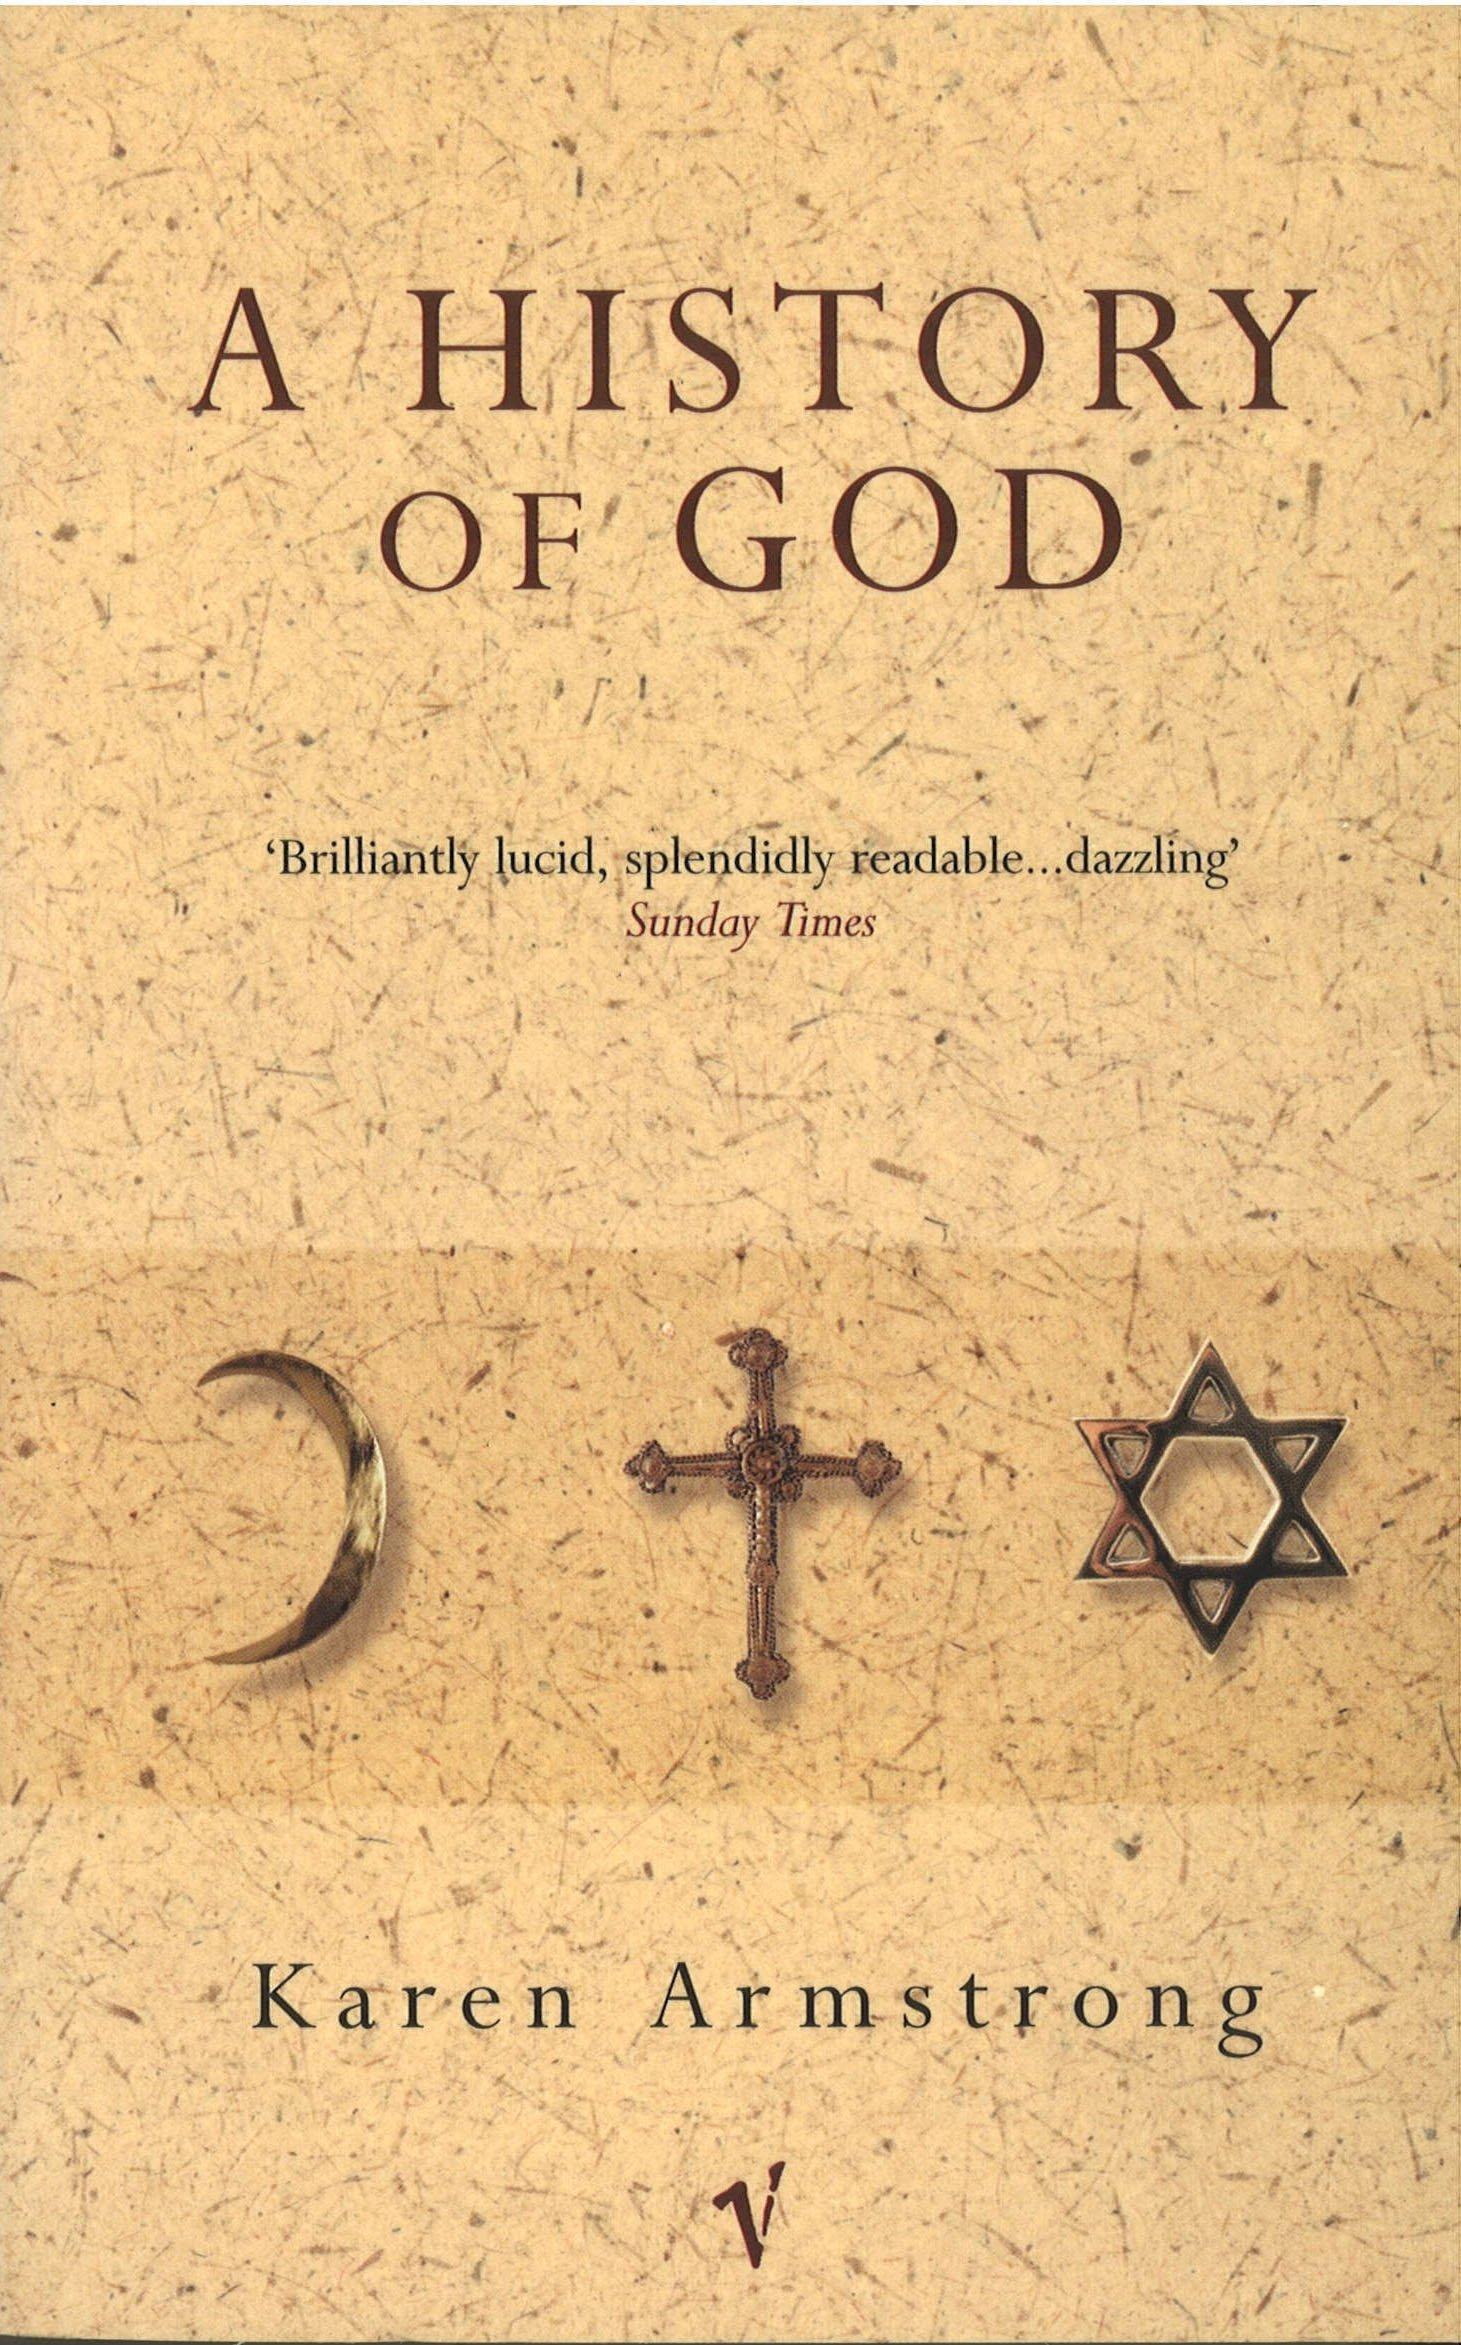 A History Of God: Amazon co uk: Karen Armstrong: 9780099273677: Books